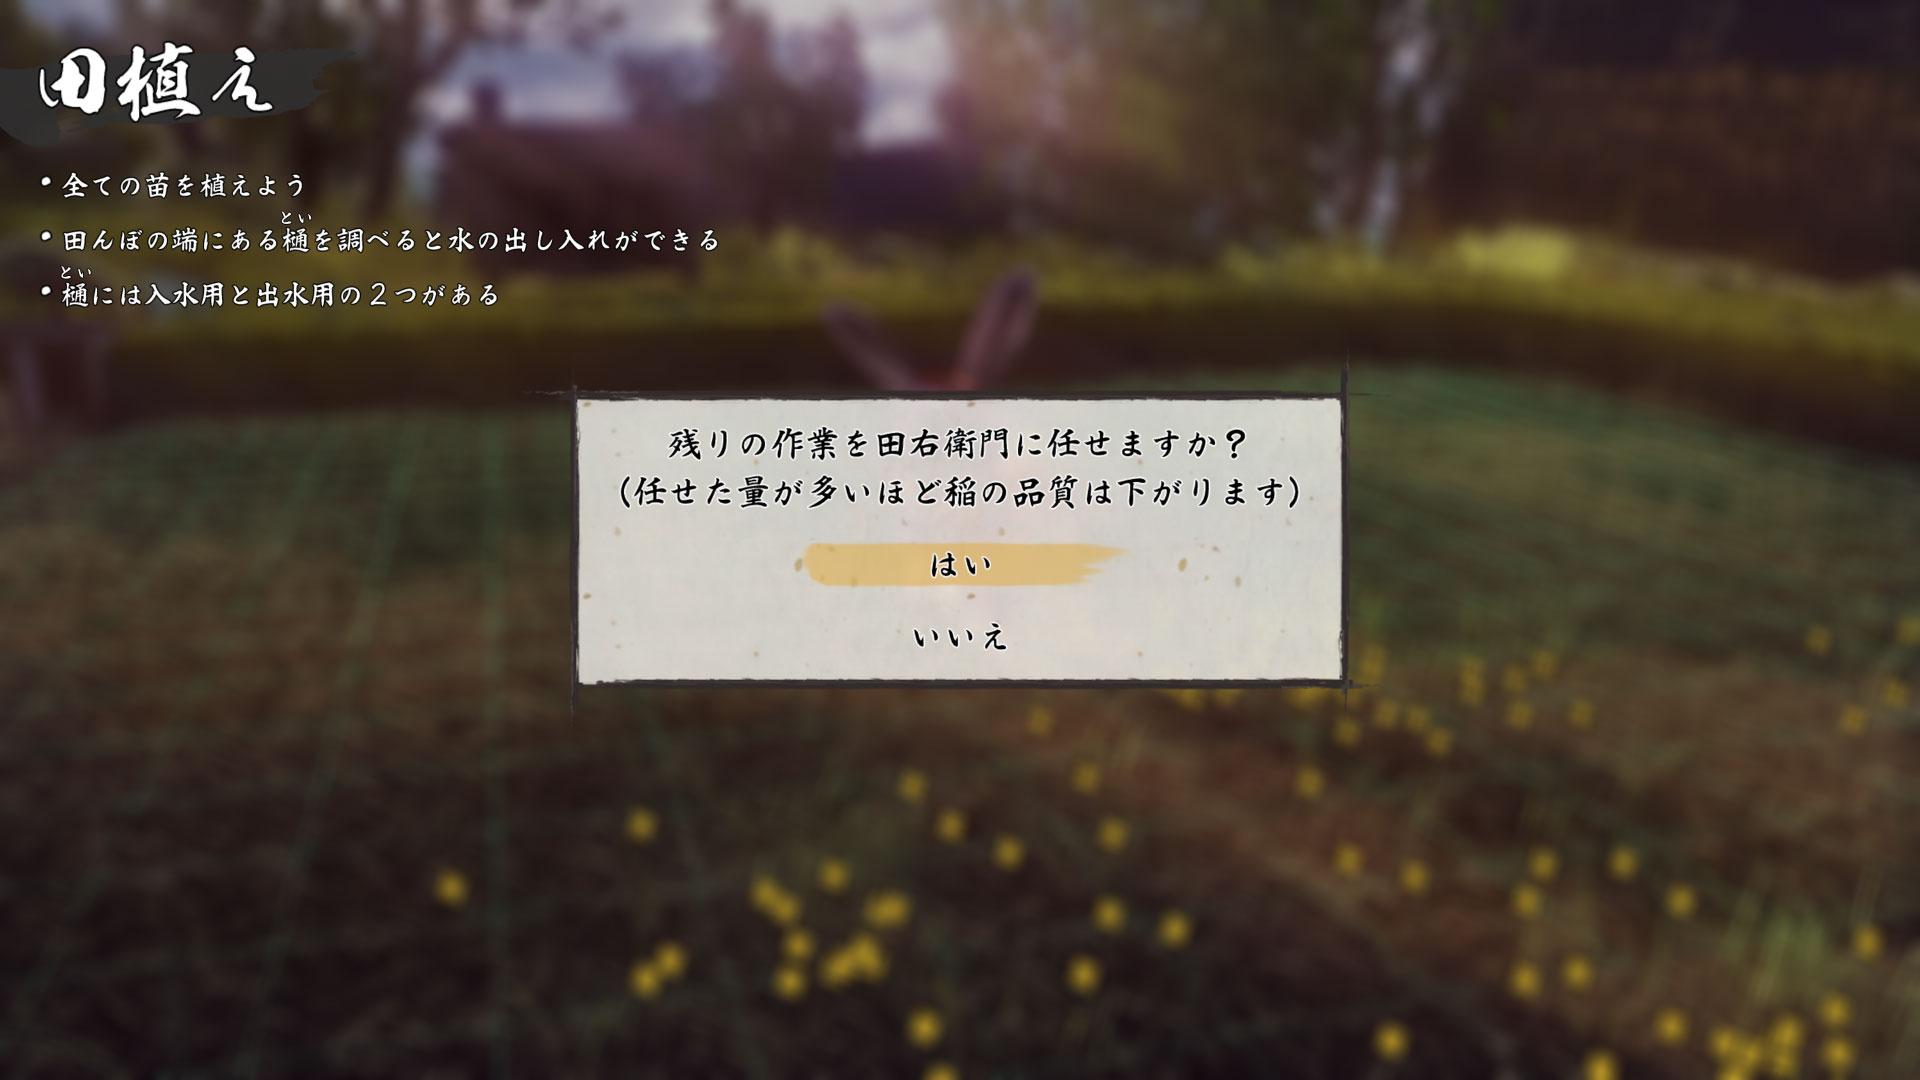 DMC v Shin Megami Tensei III a tutoriál ke Captainu Tsubasovi Sakuna Of Rice and Ruin 2020 08 11 20 006